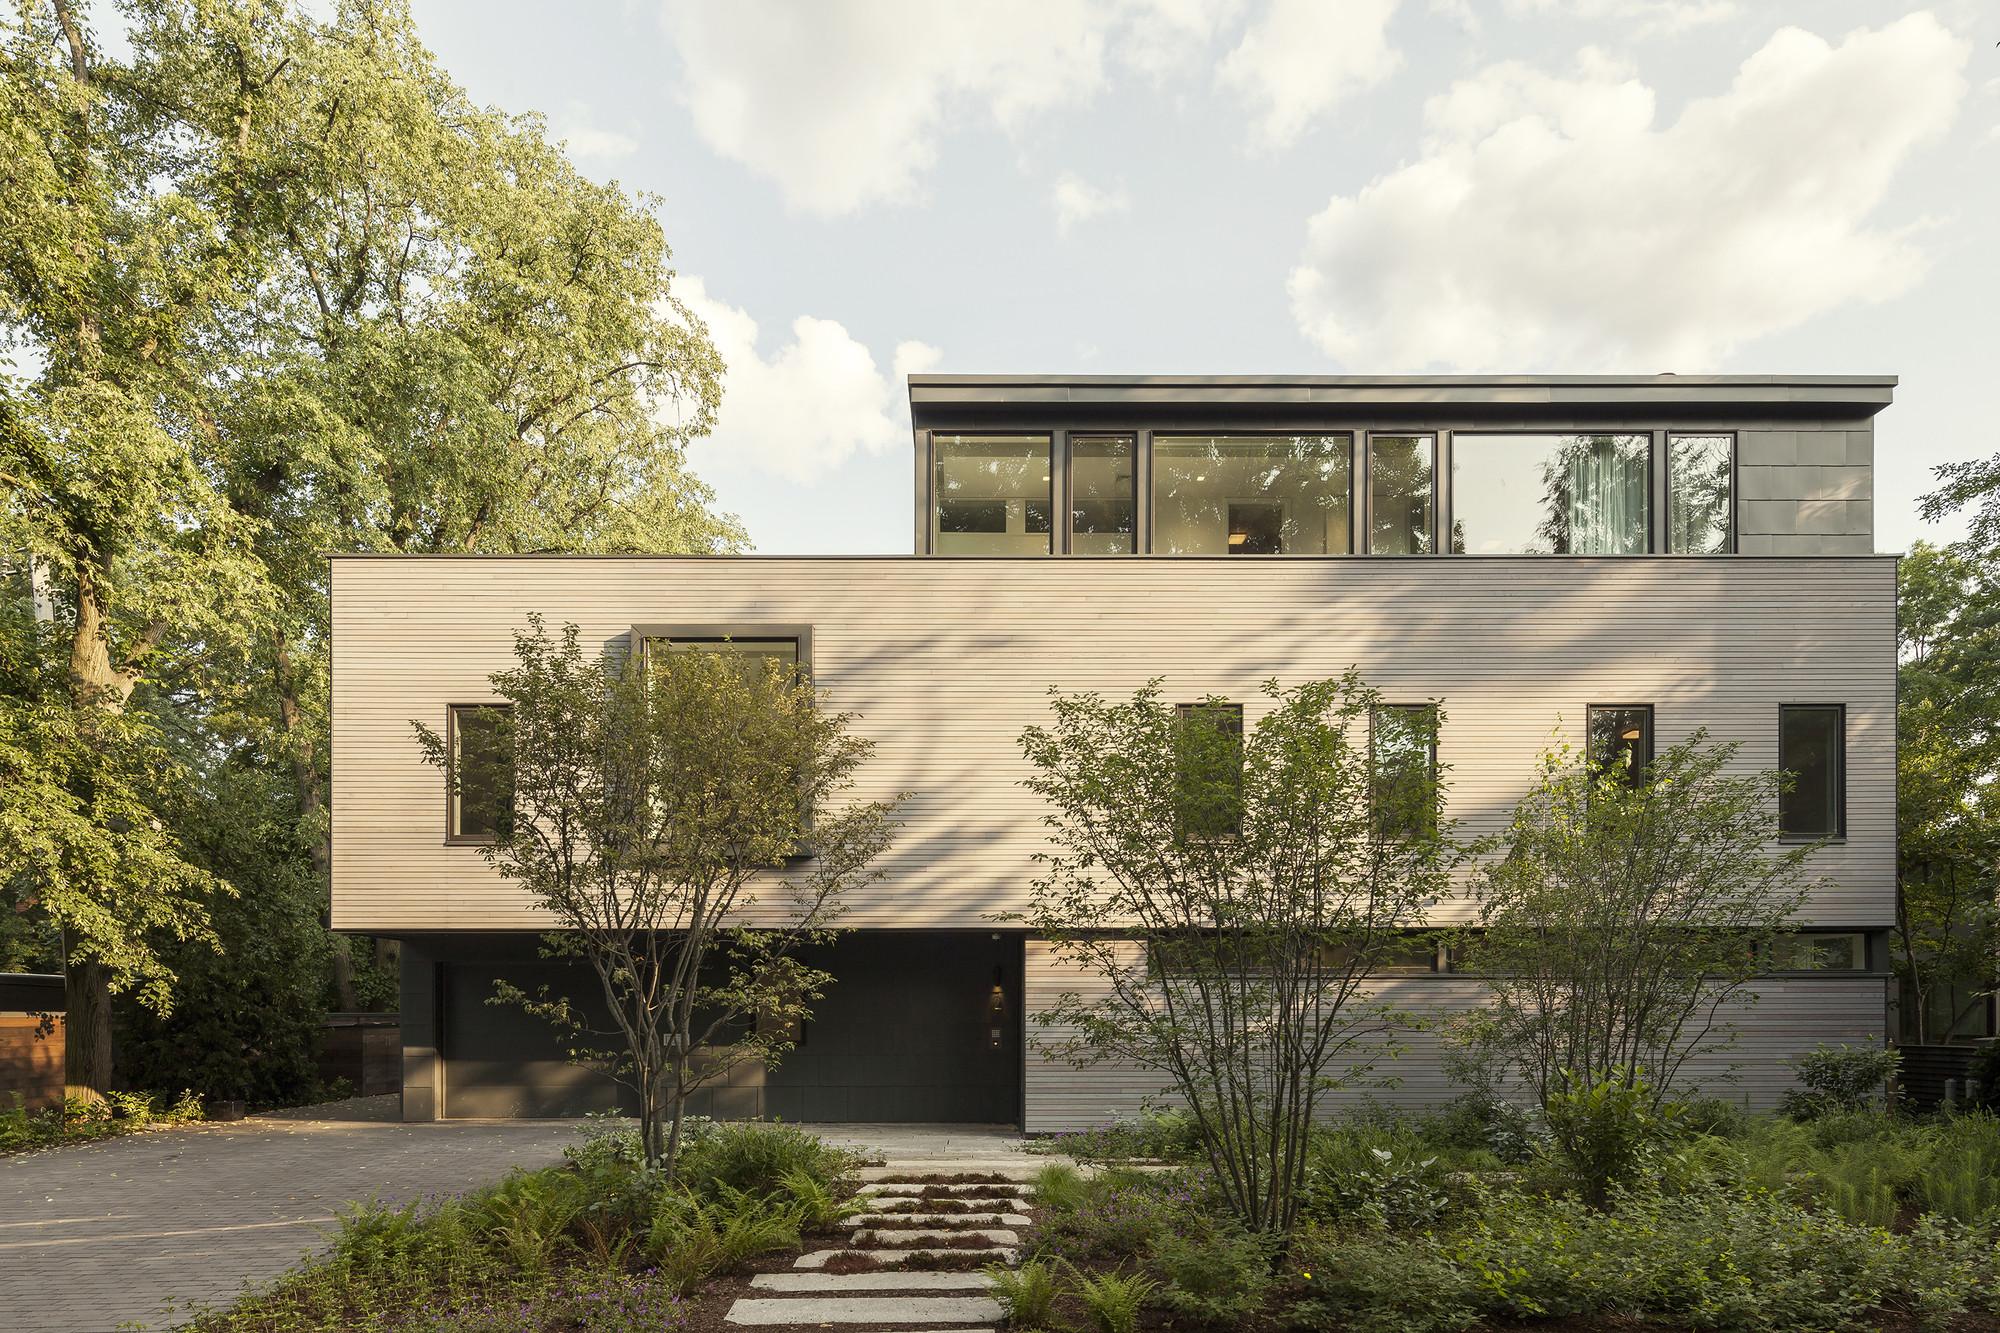 Casa en Cambridge / Anmahian Winton Architects, © Jane Messinger